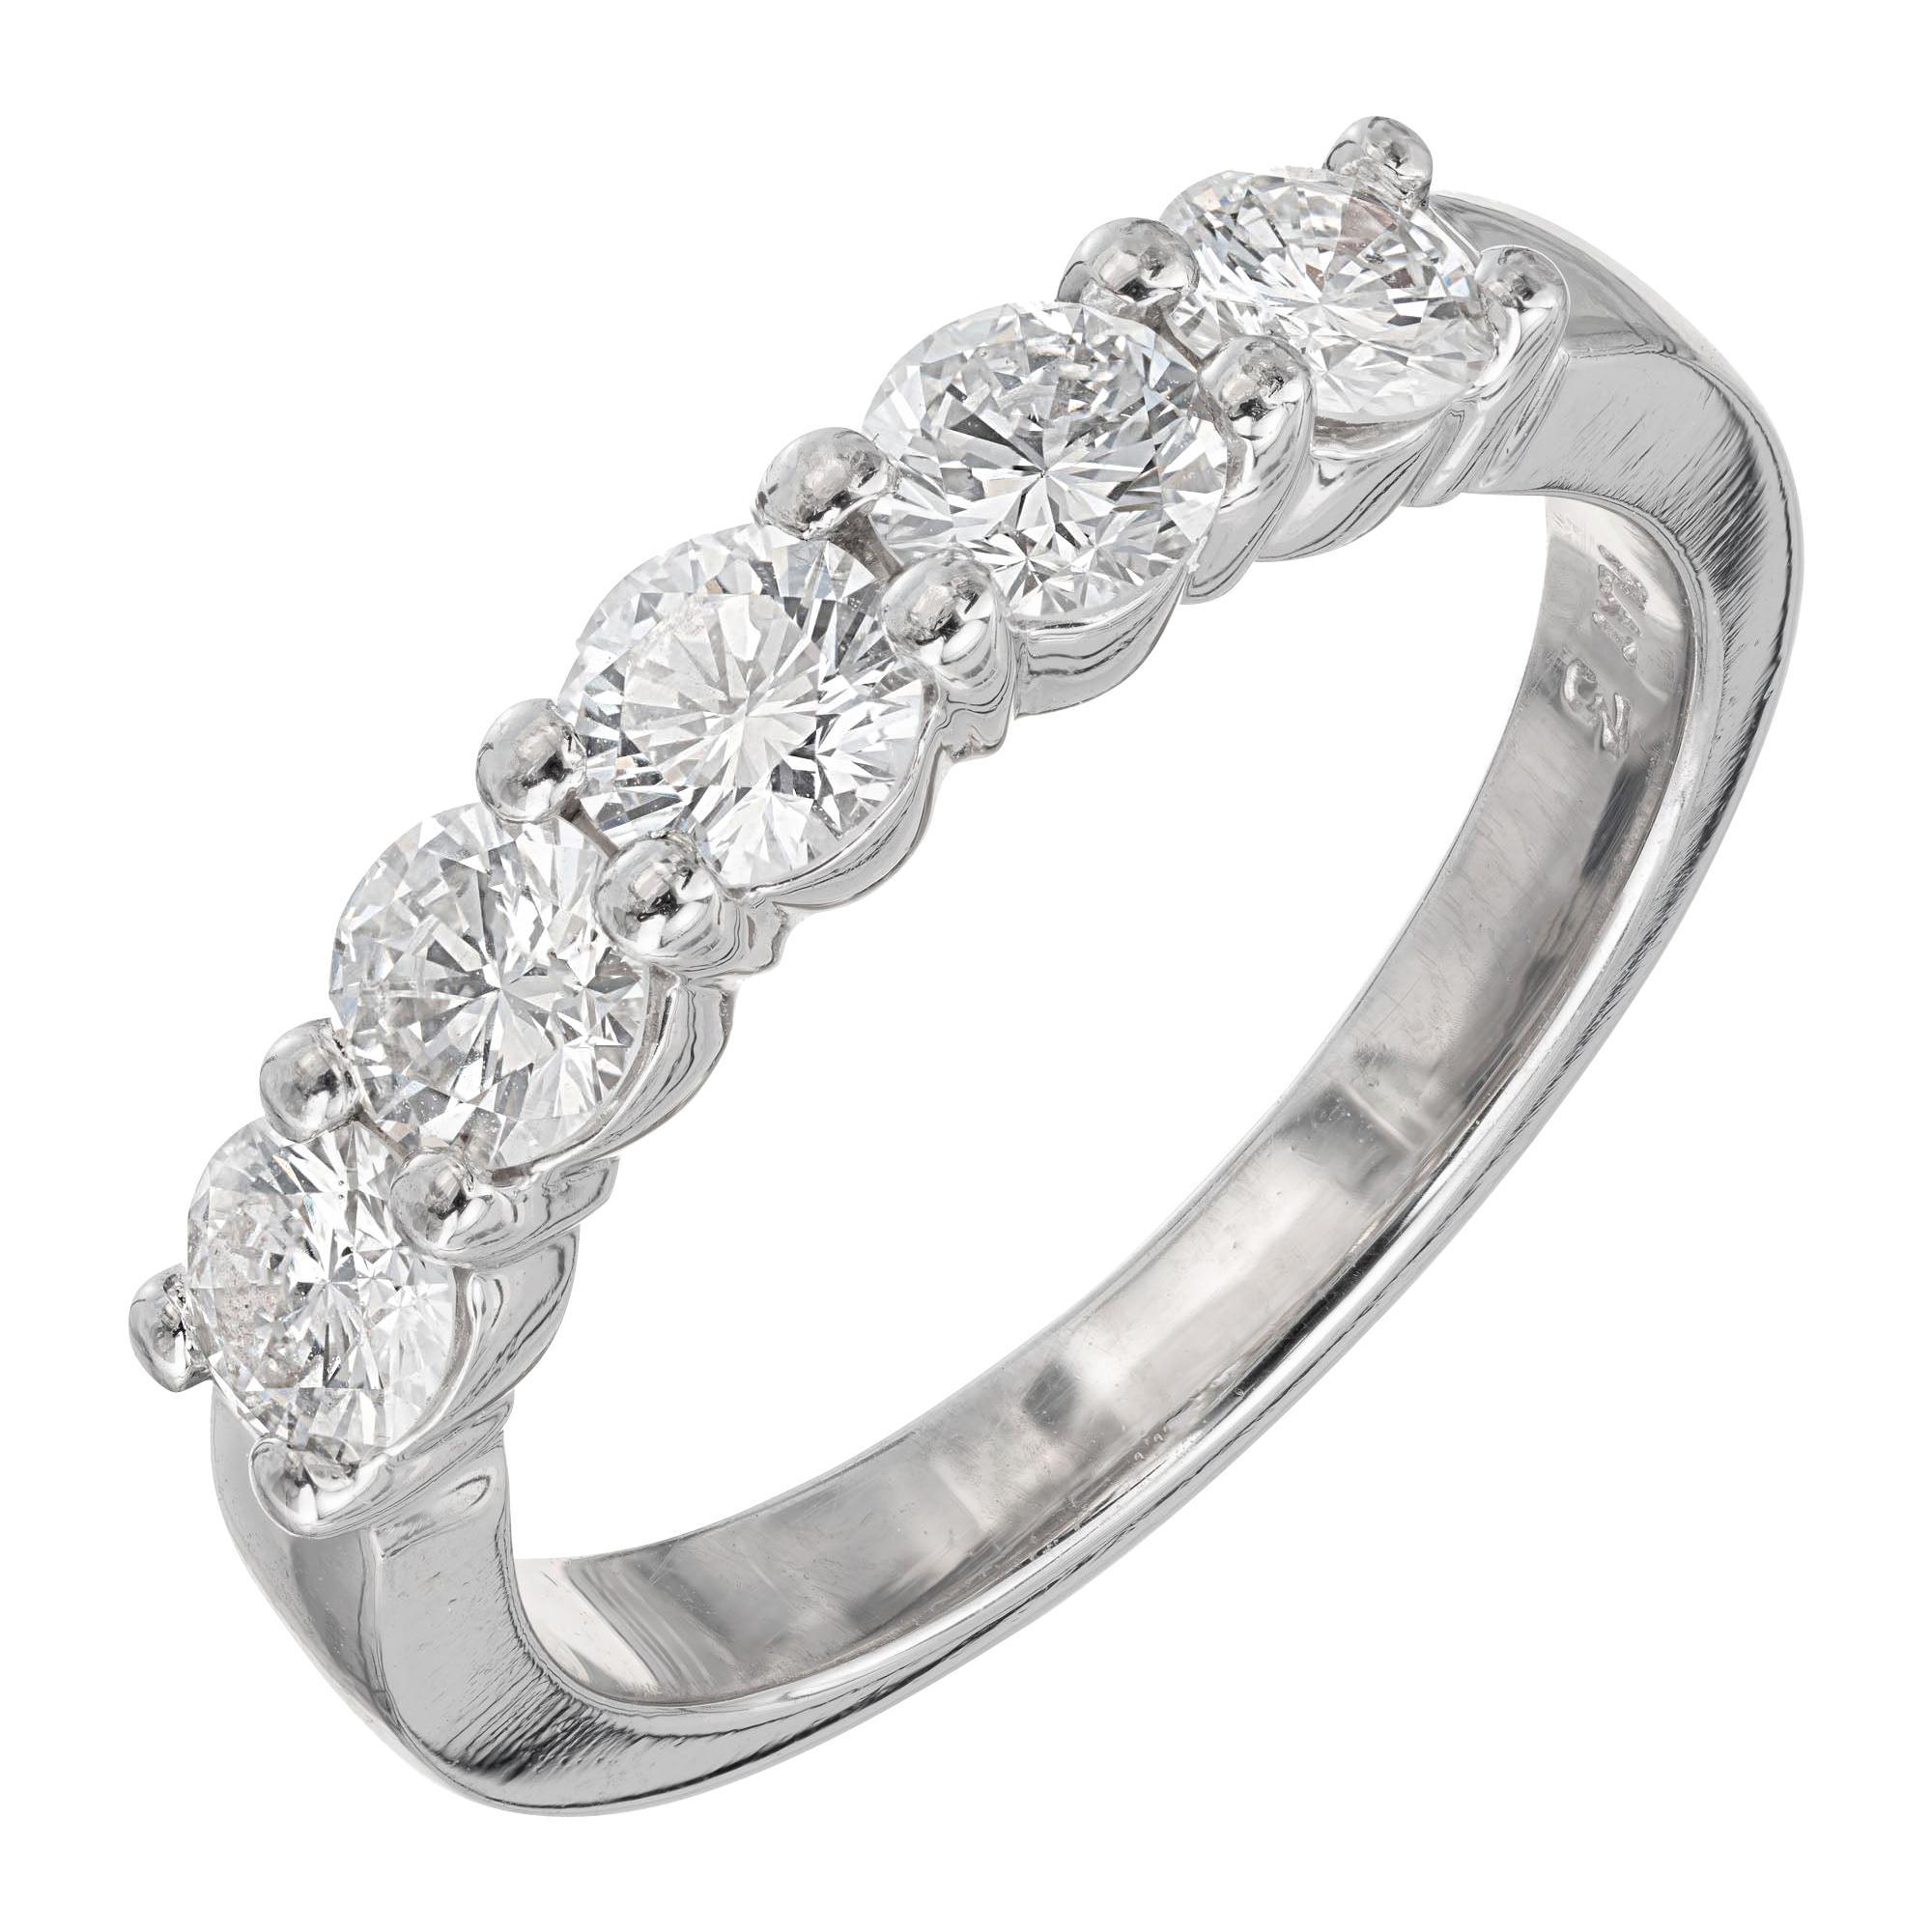 Peter Suchy 1.00 Carat Diamond Platinum Wedding Band